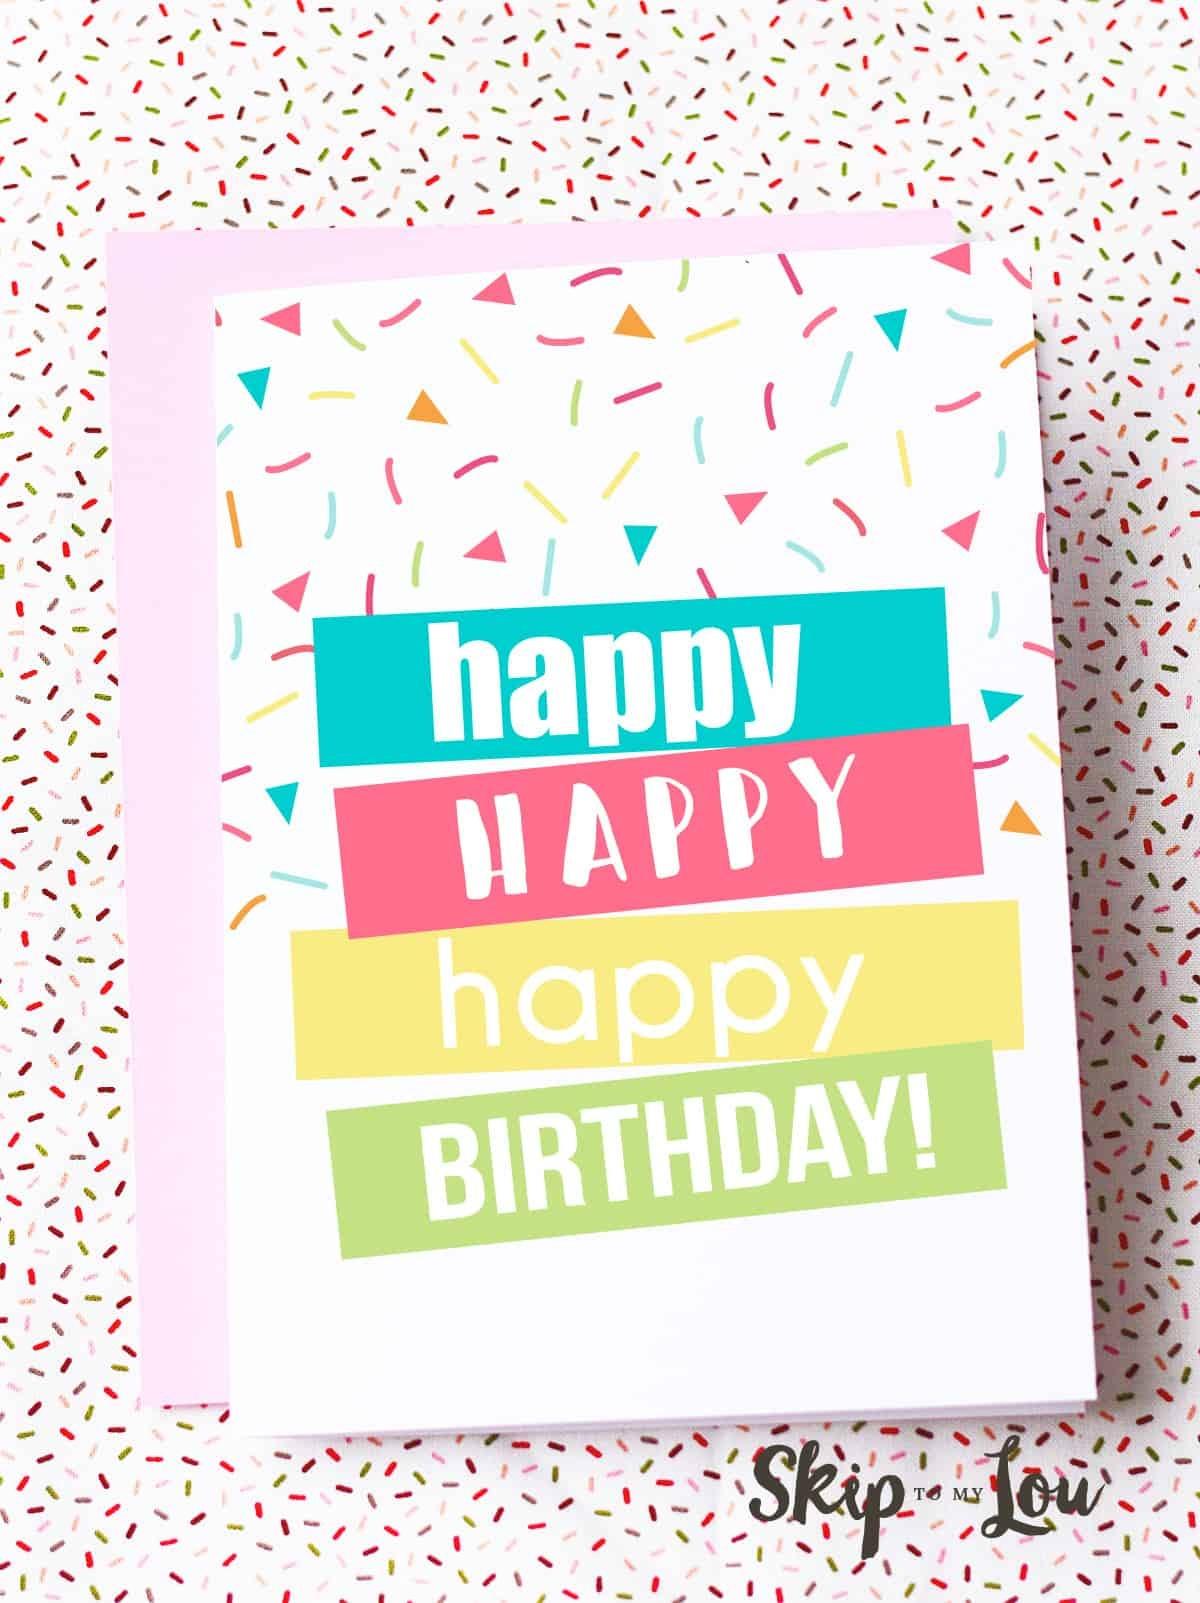 Free Printable Birthday Cards   Skip To My Lou - Free Printable Birthday Cards For Her